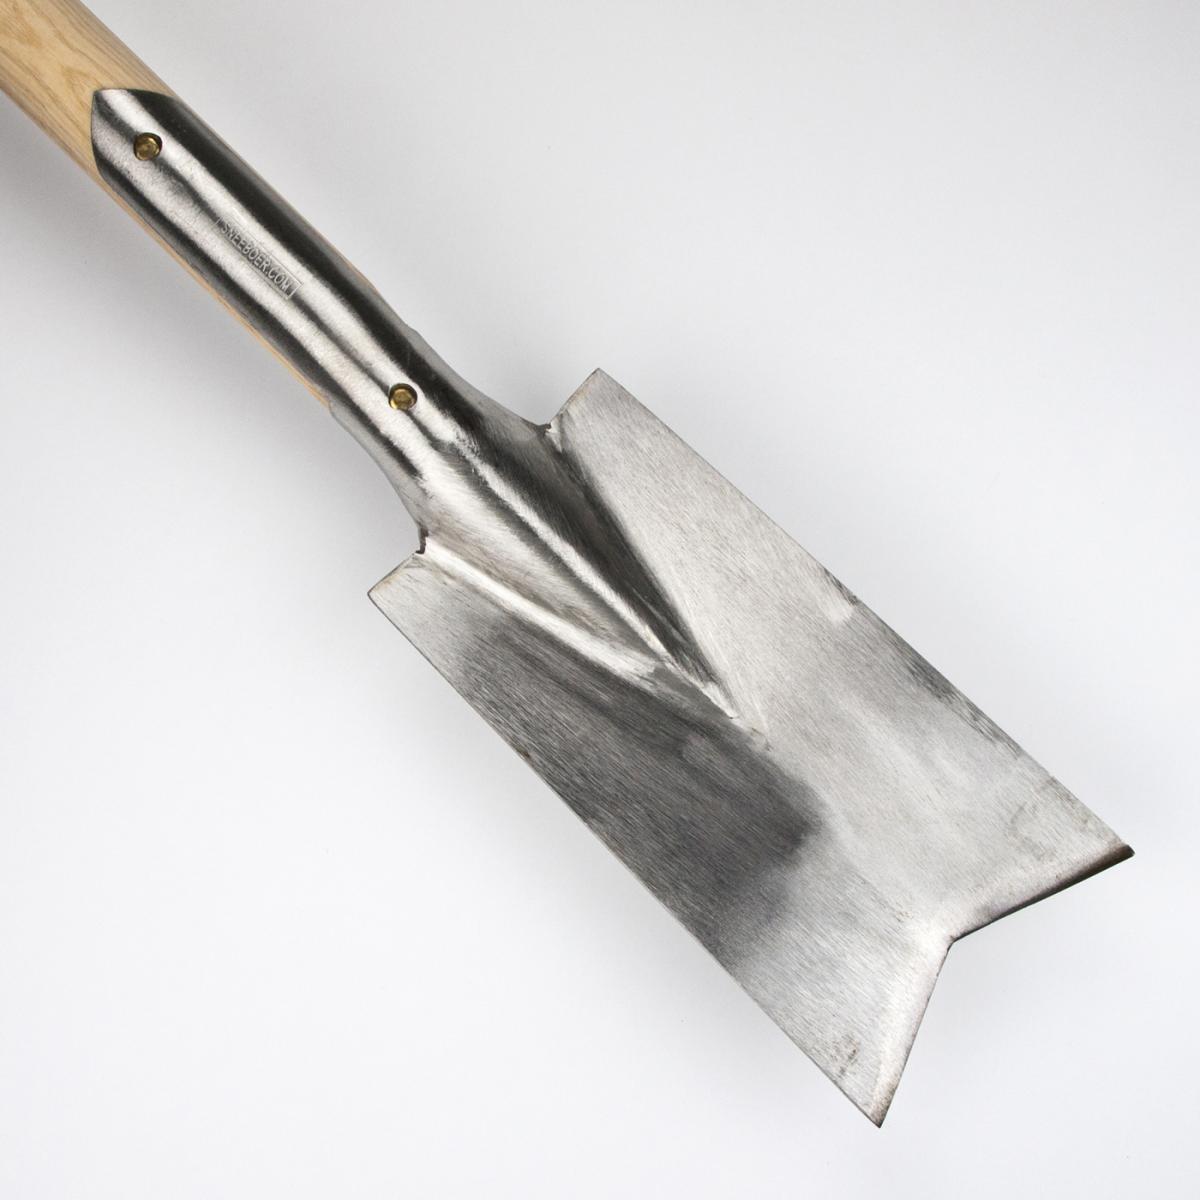 Sneeboer transplanting spade for High quality garden tools